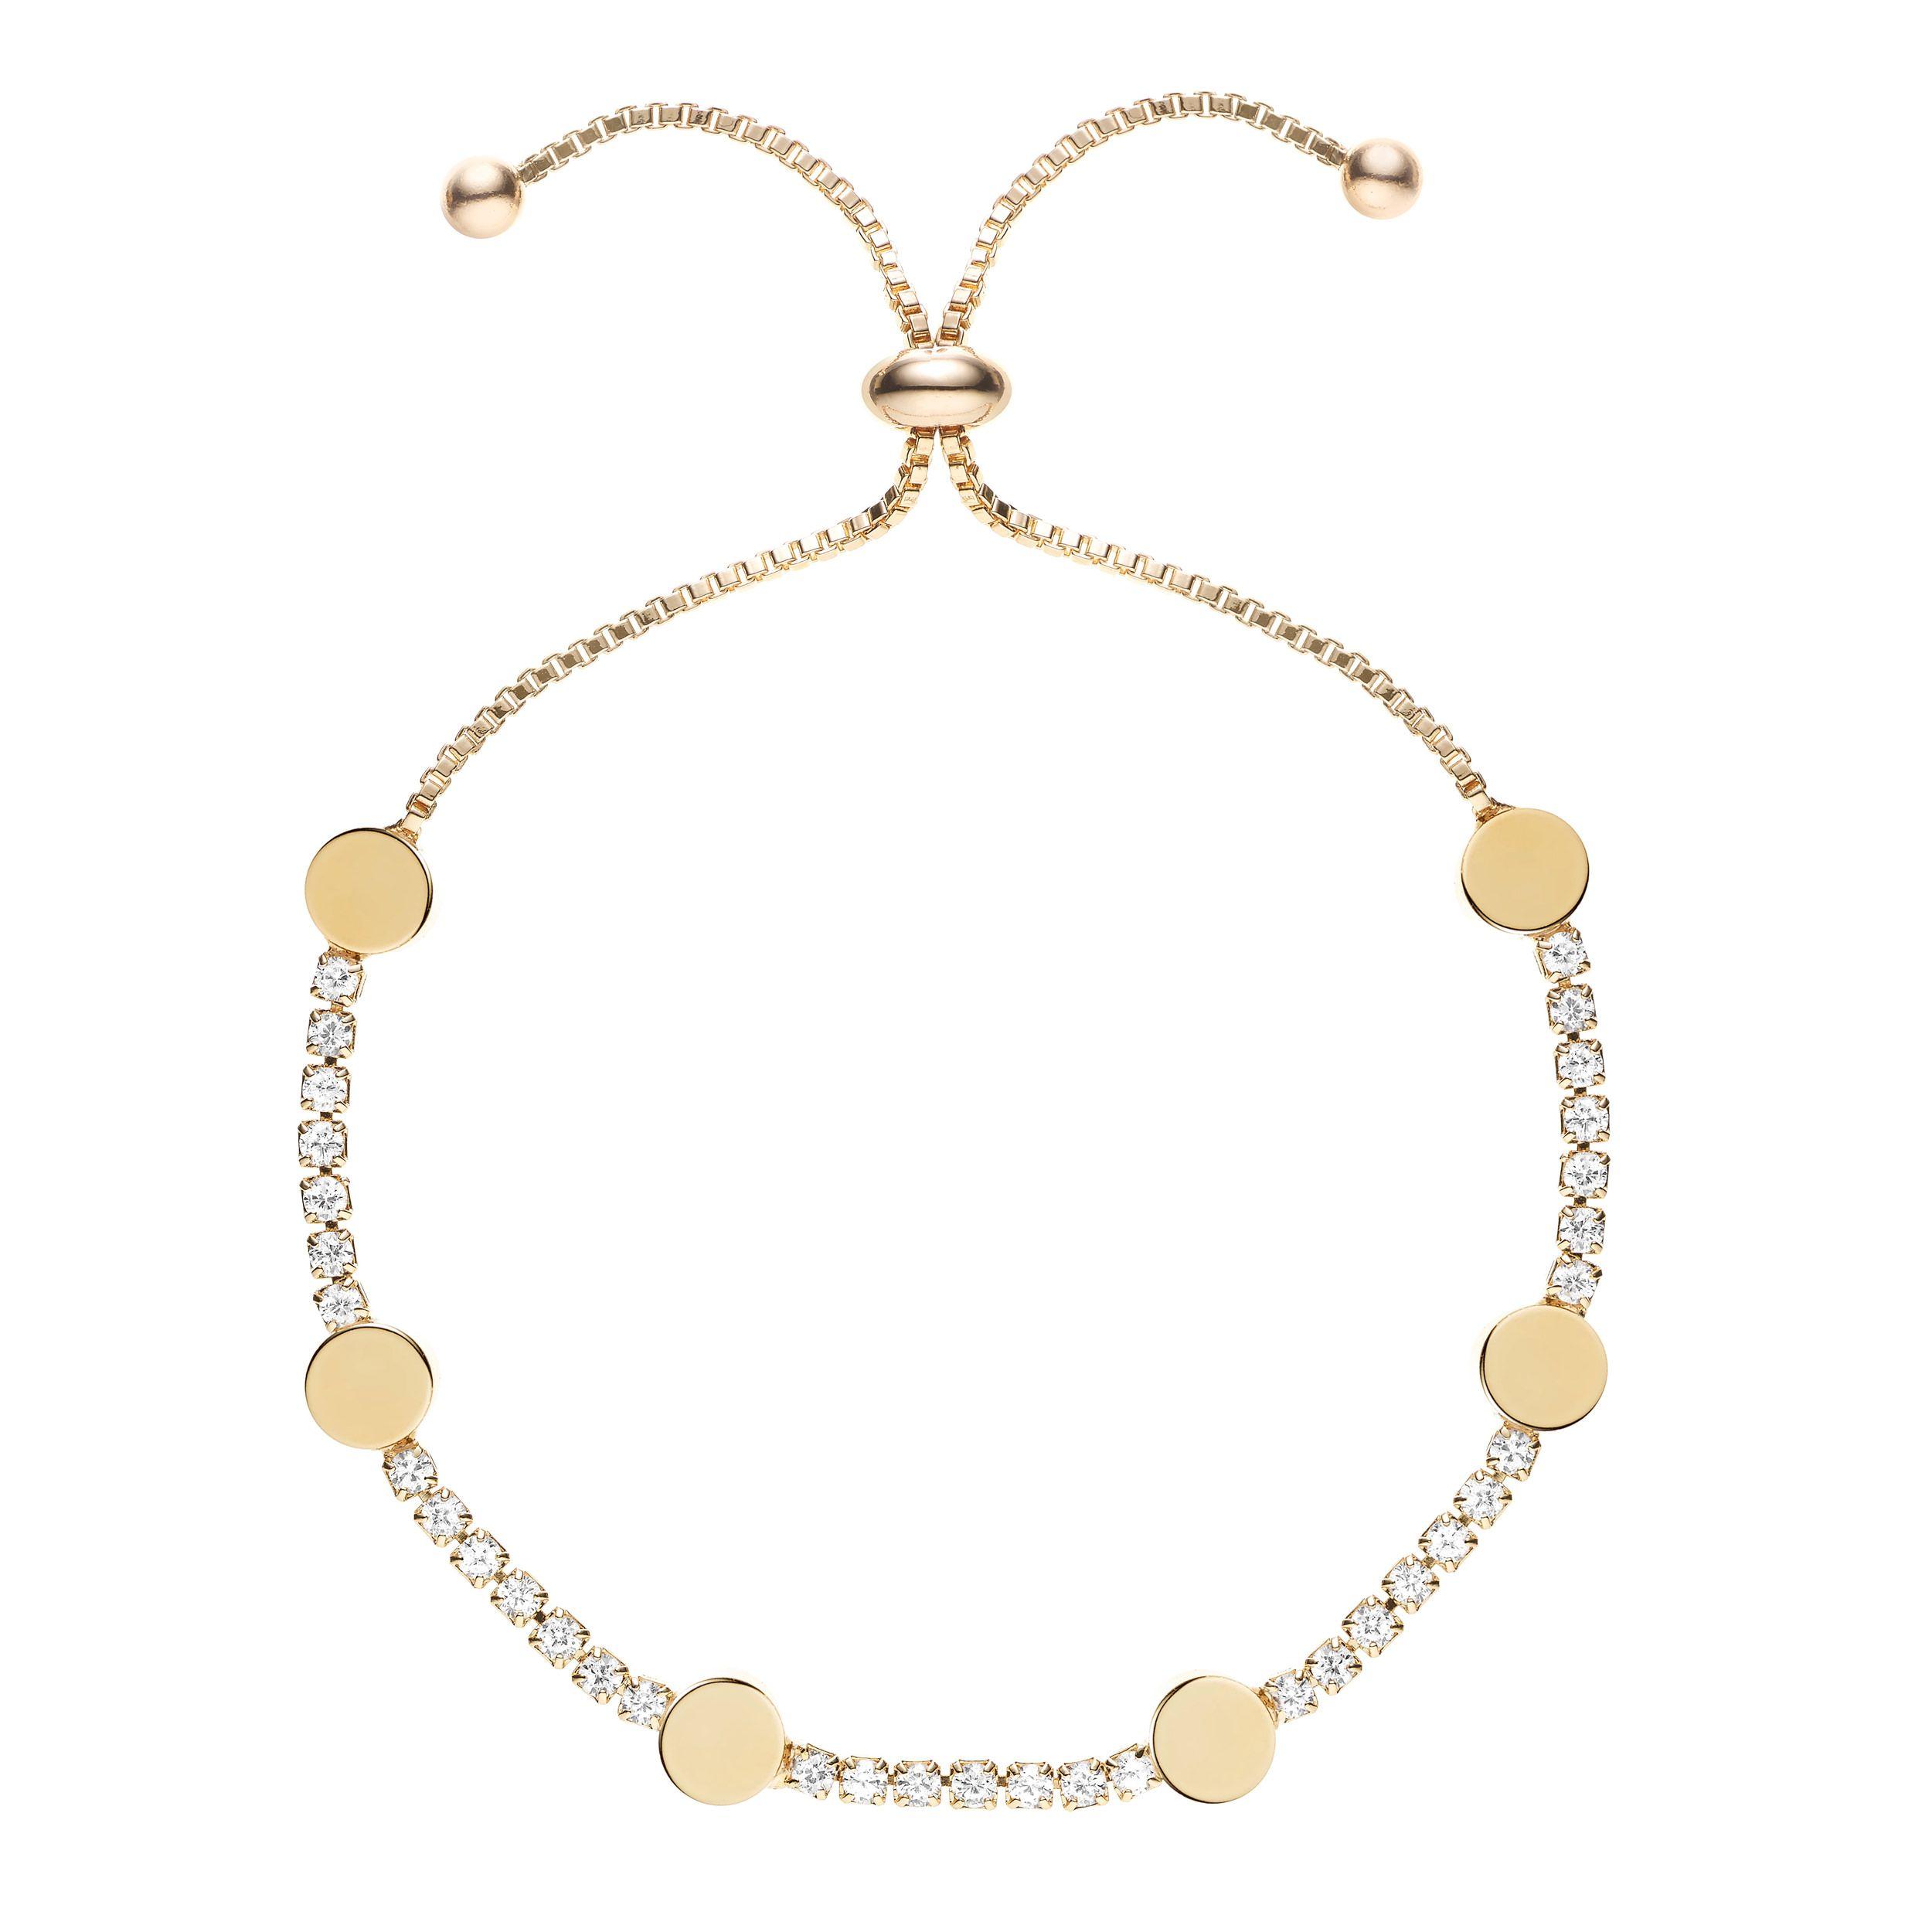 Buckley London Hugs & Kisses 'O' Bracelet - Gold